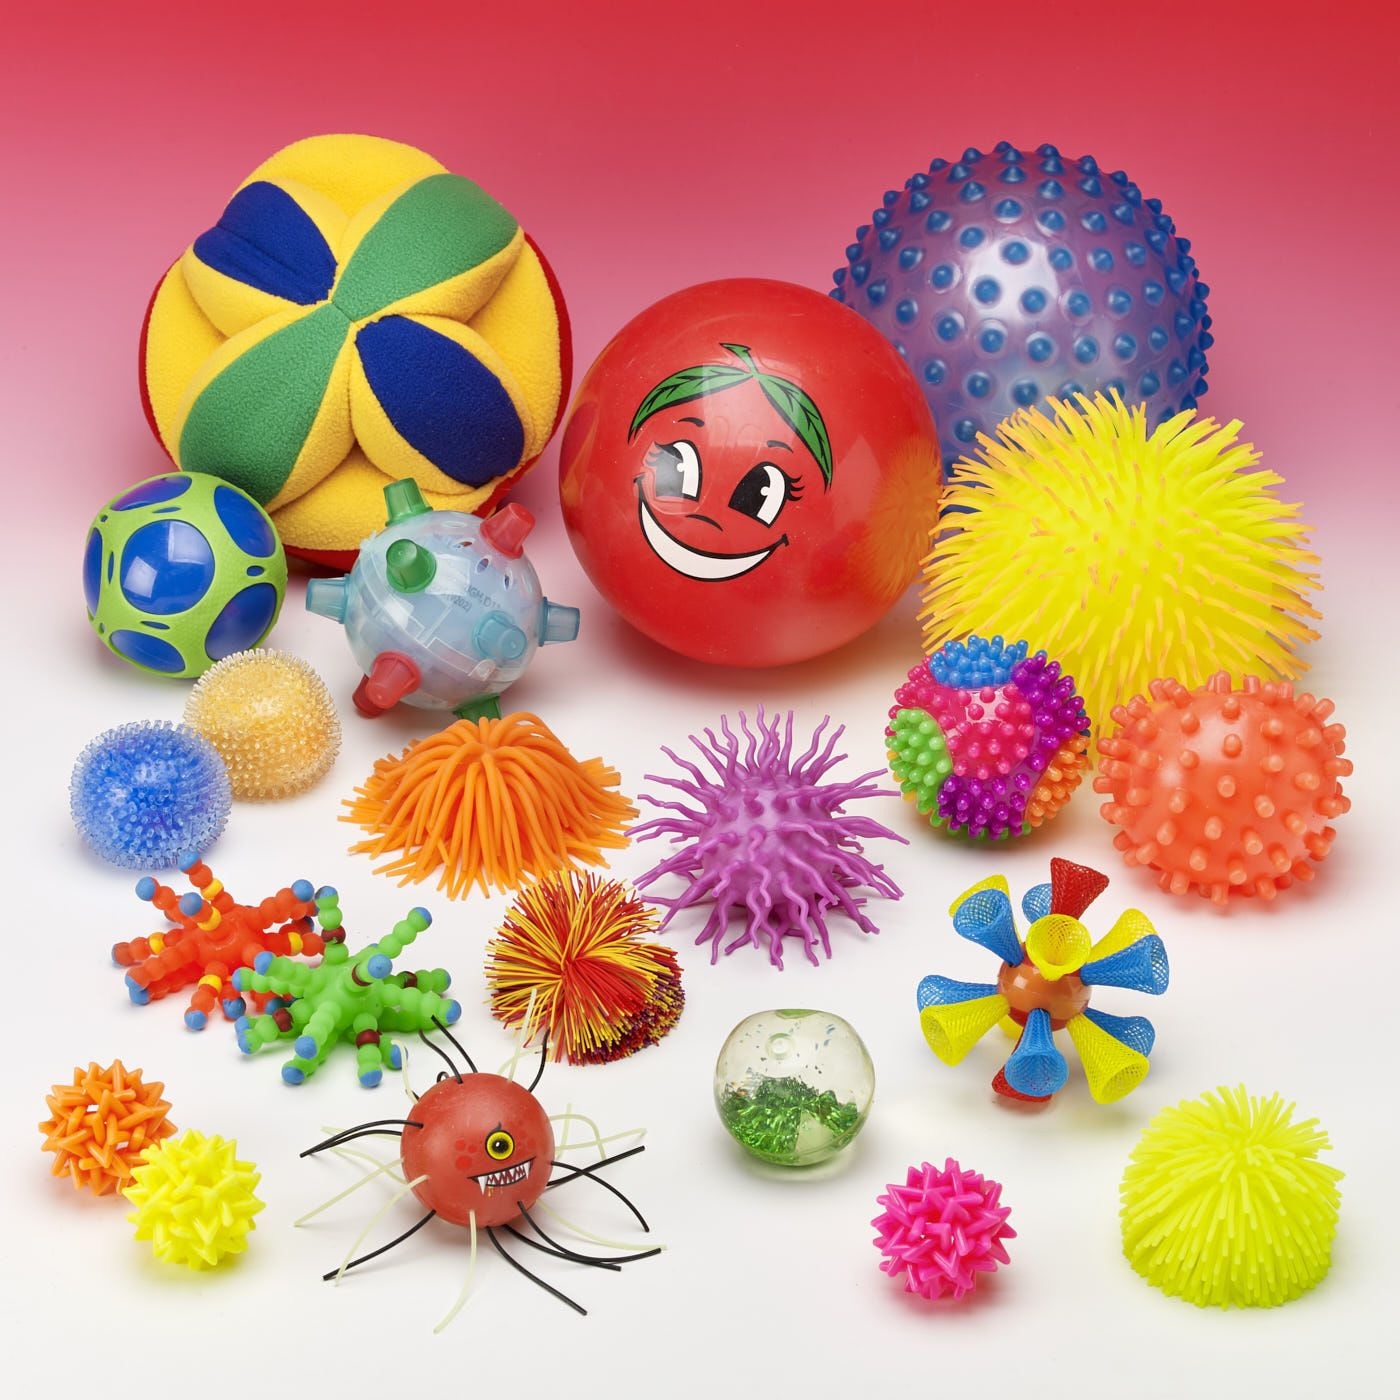 Sensory Ball Exploration Bag - NEW REVISED CONTENT!